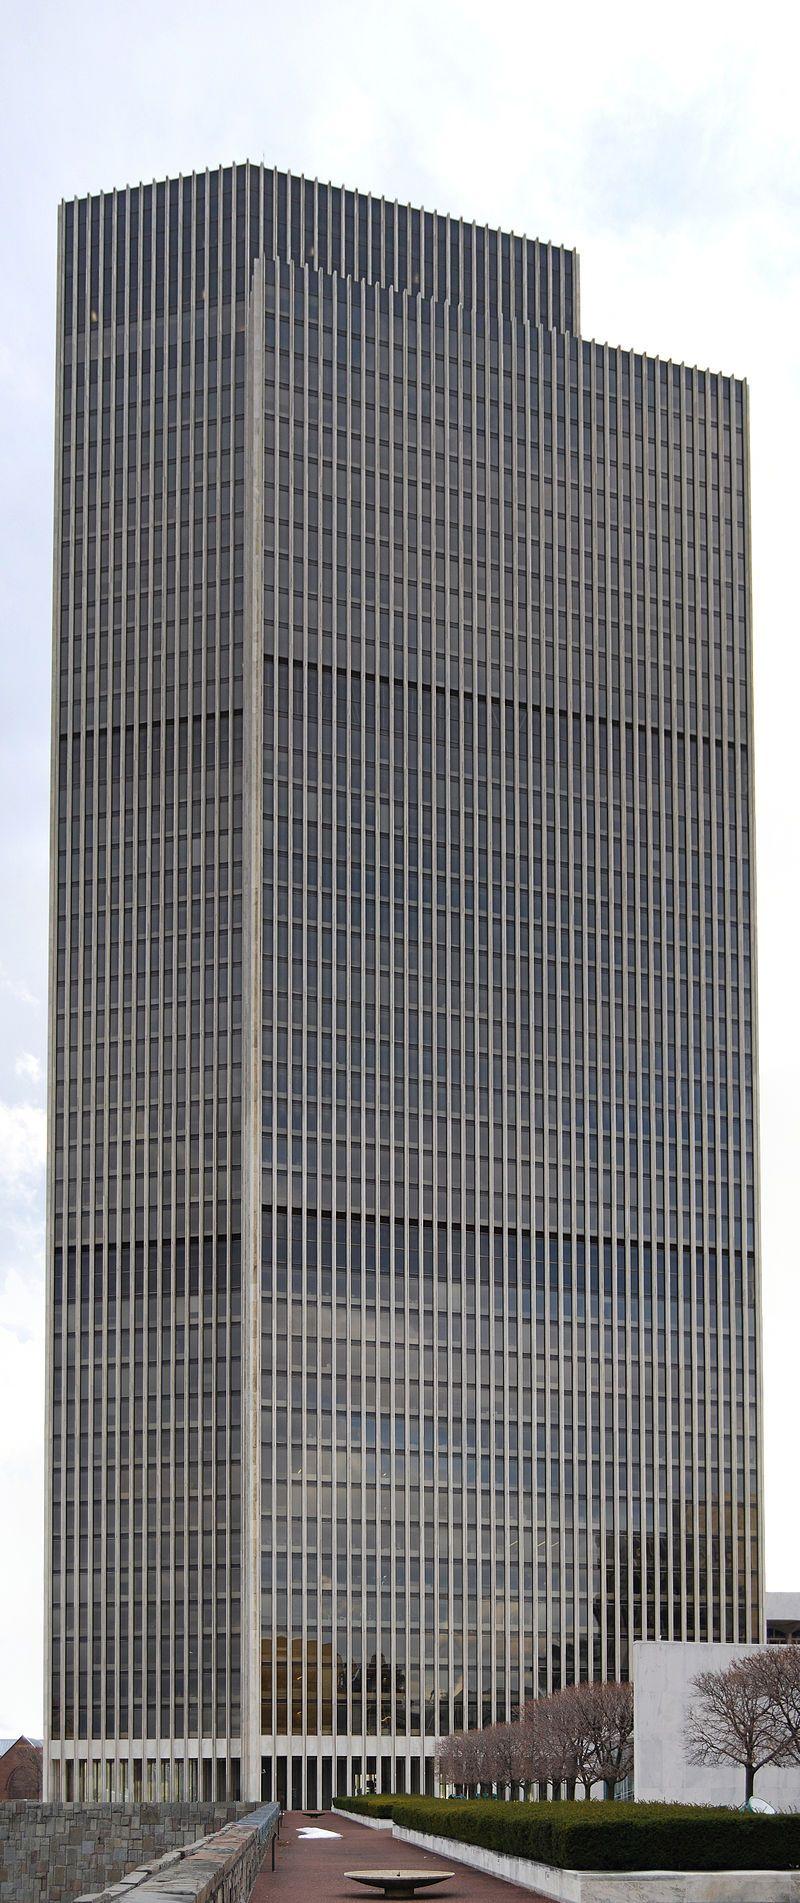 CorningTowerPanorama - Empire State Plaza - Wikipedia